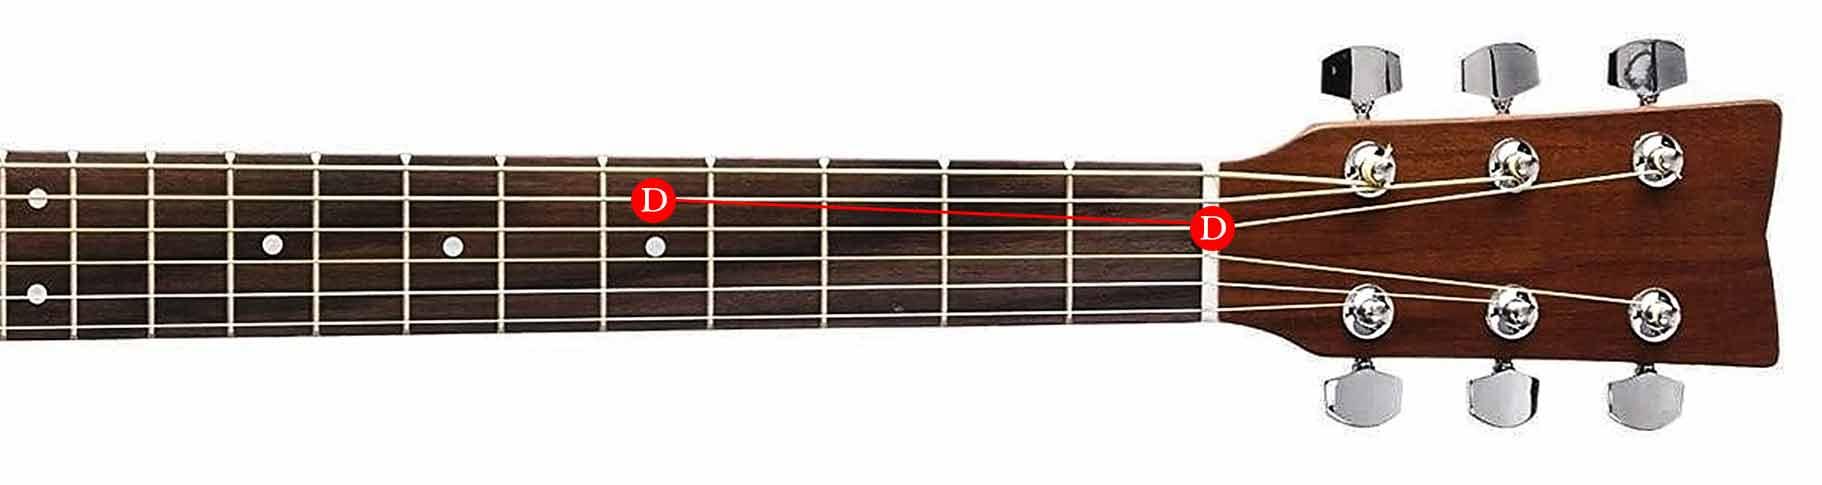 Guitar Tuning Method 2-04